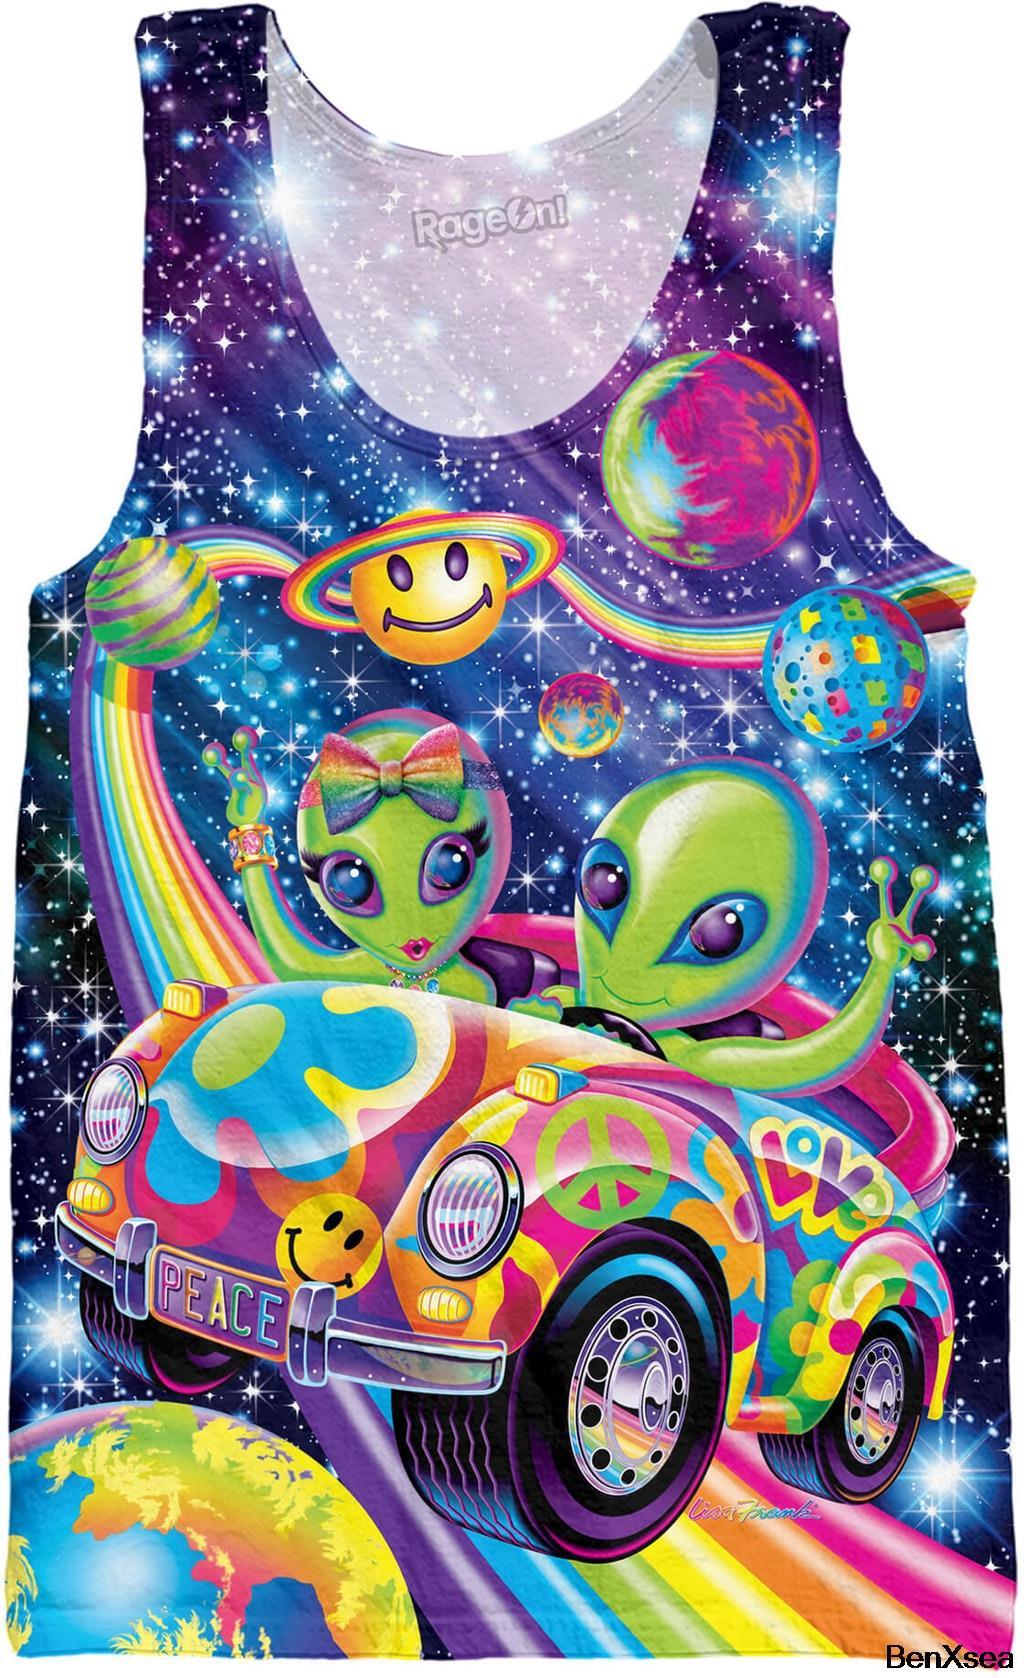 Lisa Franca Aliens/Skye/Hunter/Parte Superior Do Tanque 3d Impresso Vest Camisola Unisex Forrest Jersey T Shirt Mais tamanho